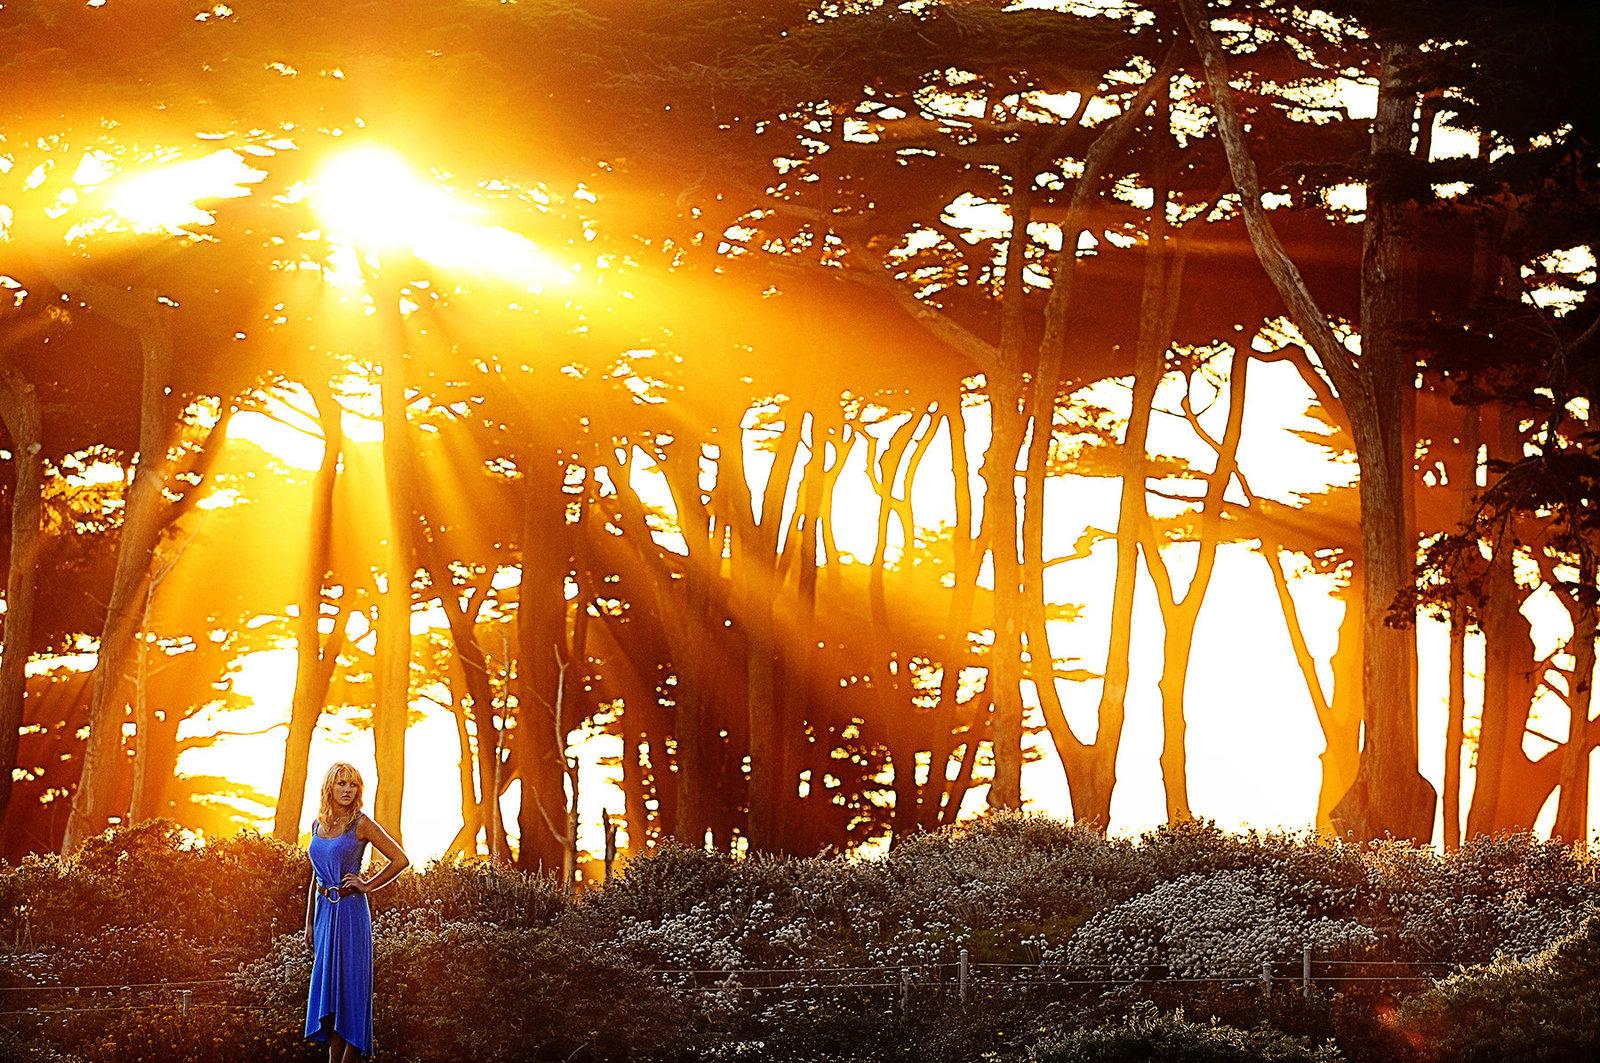 san francisco california senior photos destination portrait photographer bryan newfield photography 60